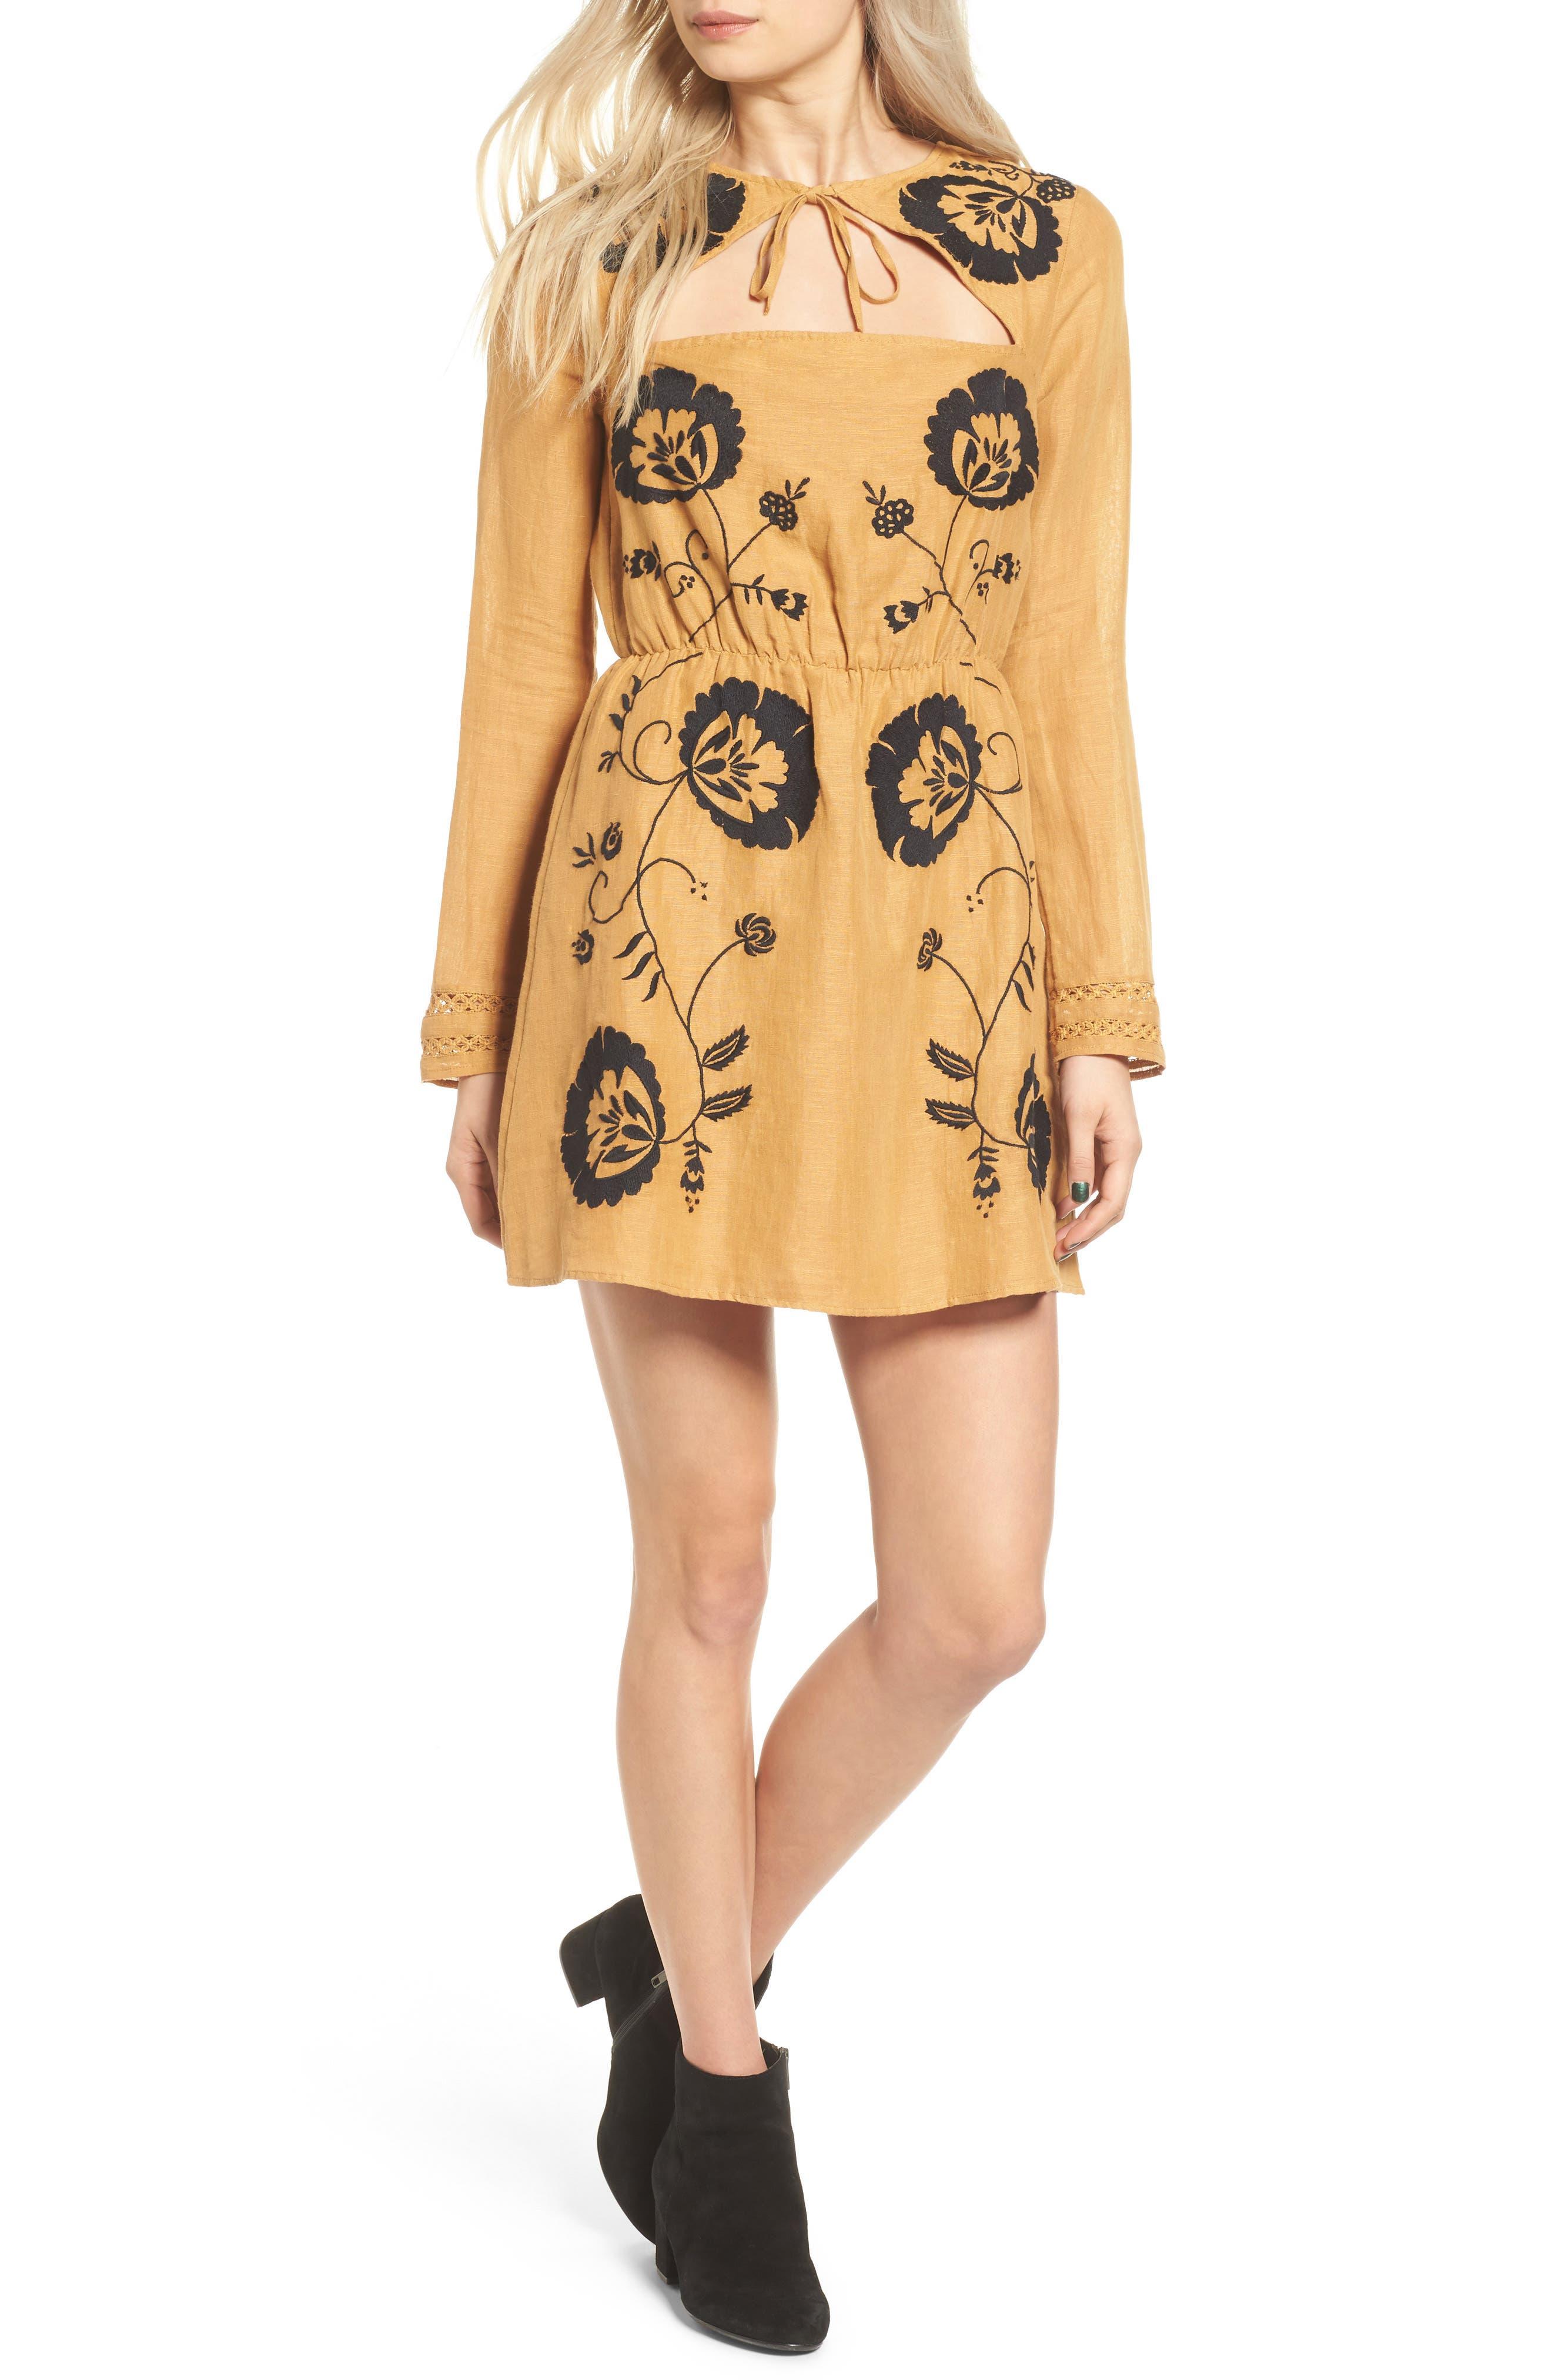 Alternate Image 1 Selected - Tularosa Keeylan Embroidered Dress